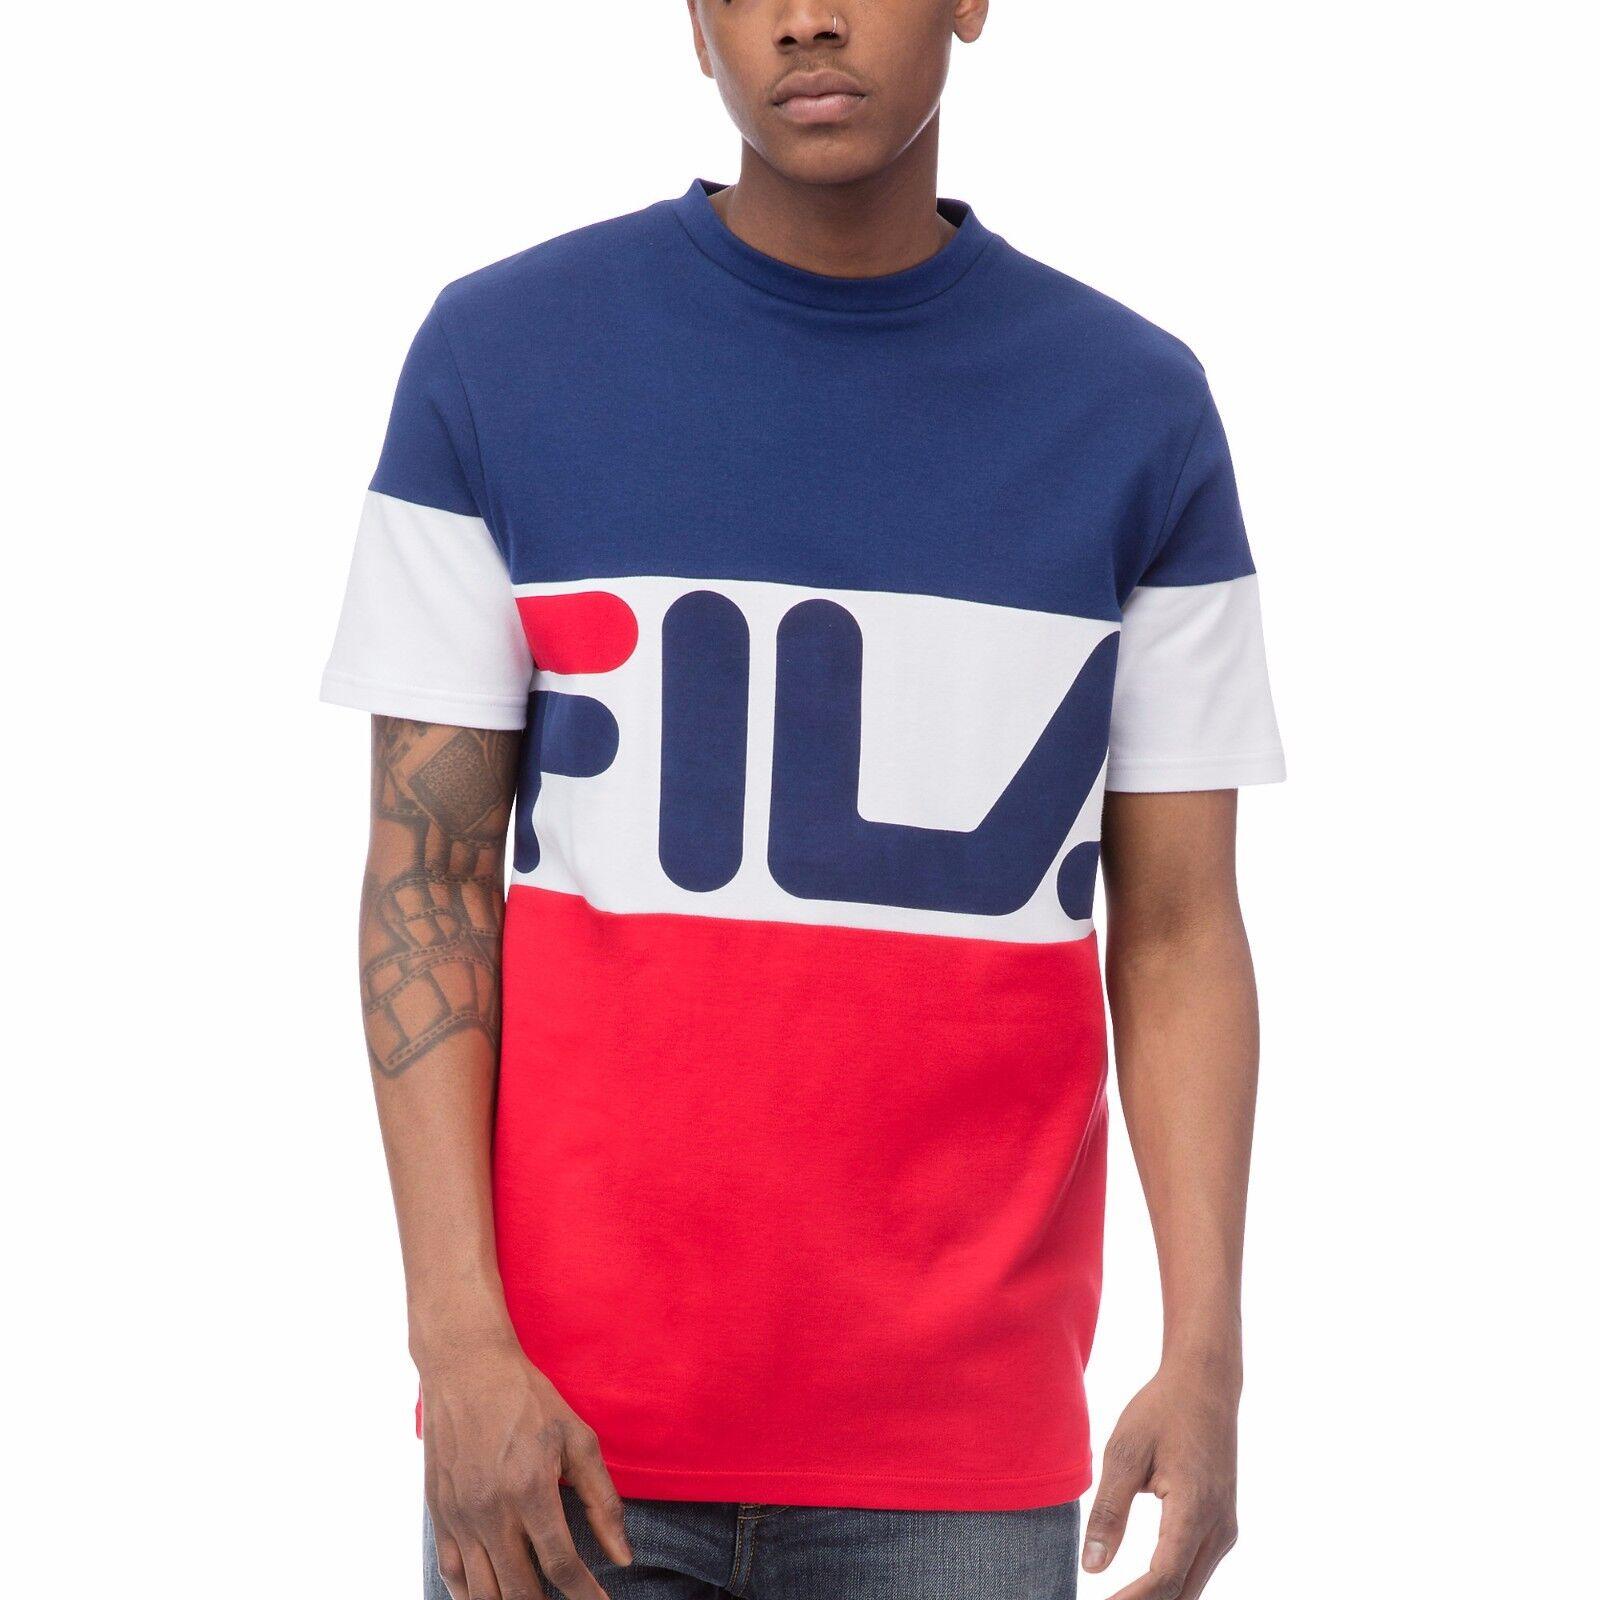 new authentic men fila t shirts graphics vialli tee lm163up1 413 fila logo ebay. Black Bedroom Furniture Sets. Home Design Ideas